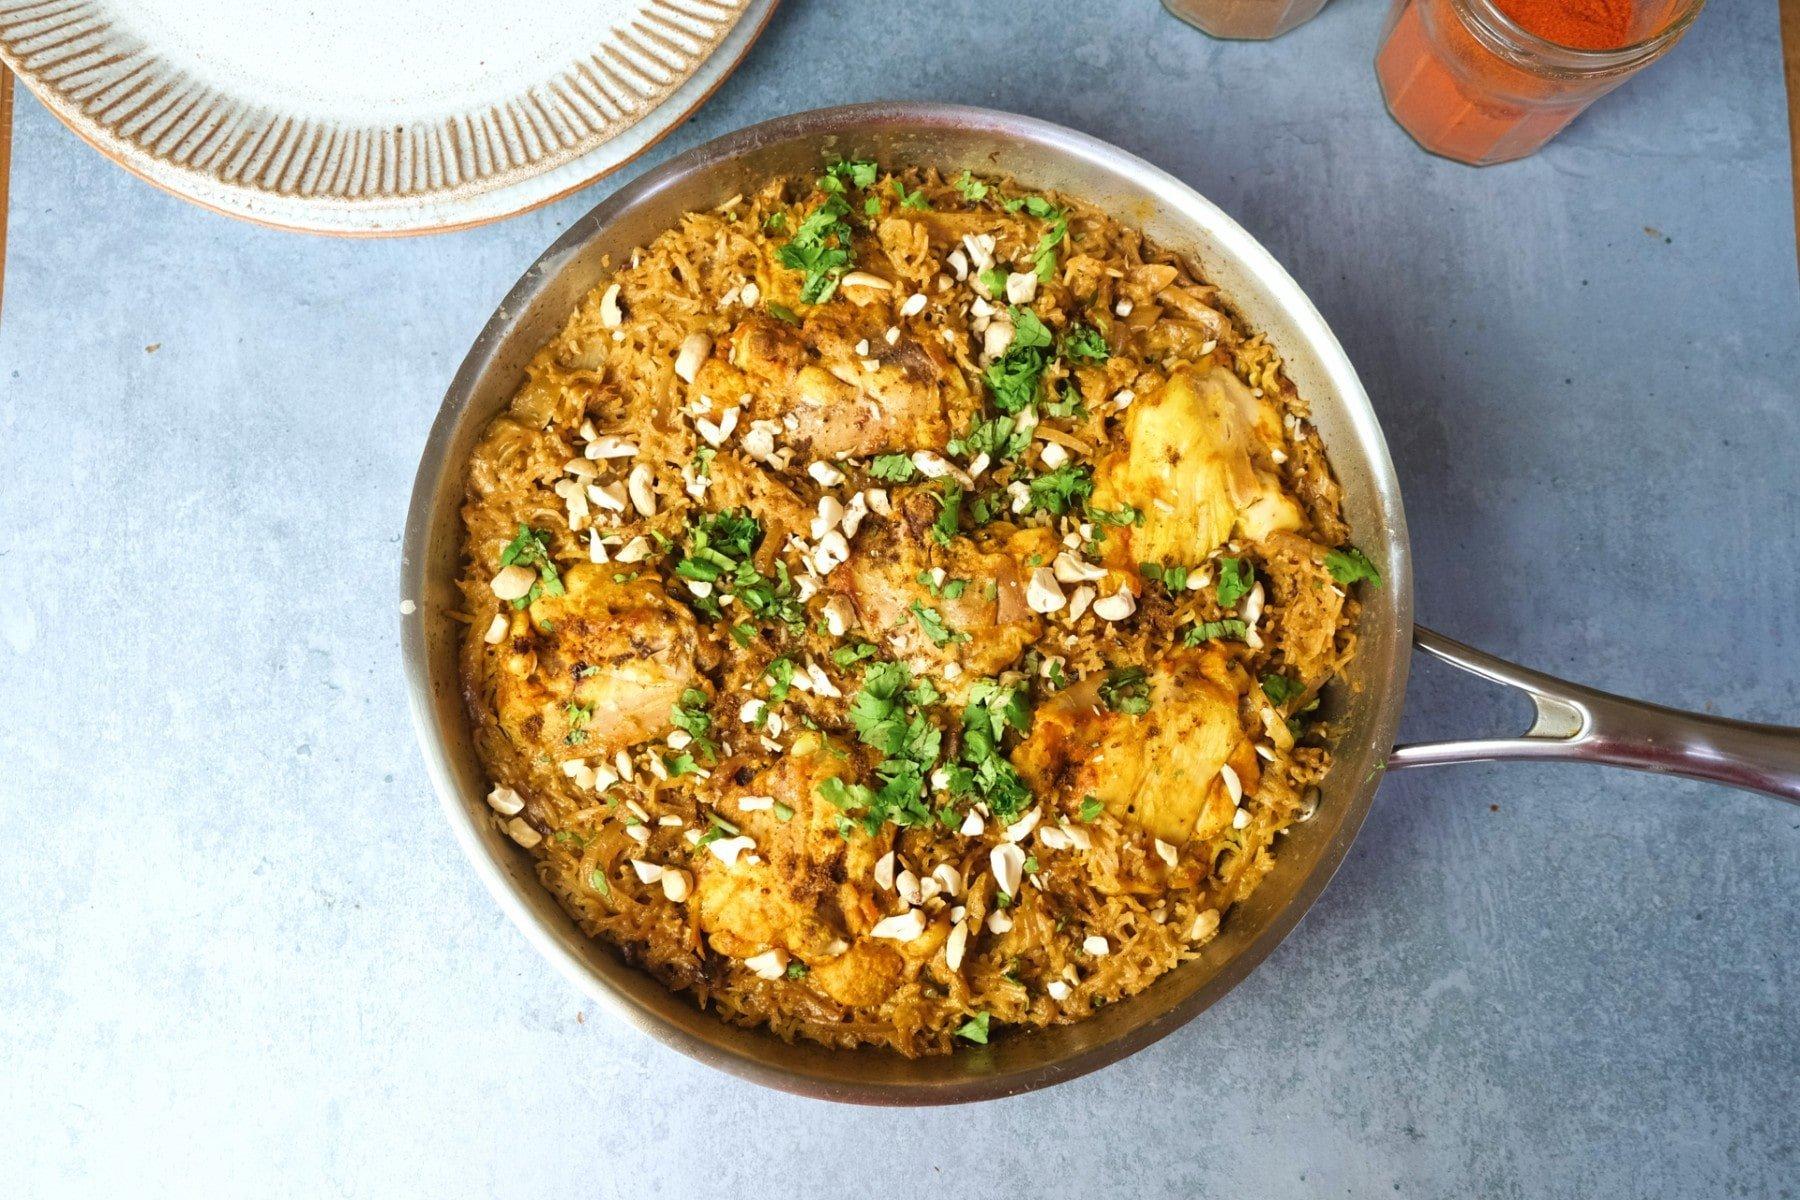 Kokos-Hähnchen & Reis Eintopf | Leichte Meal Prep